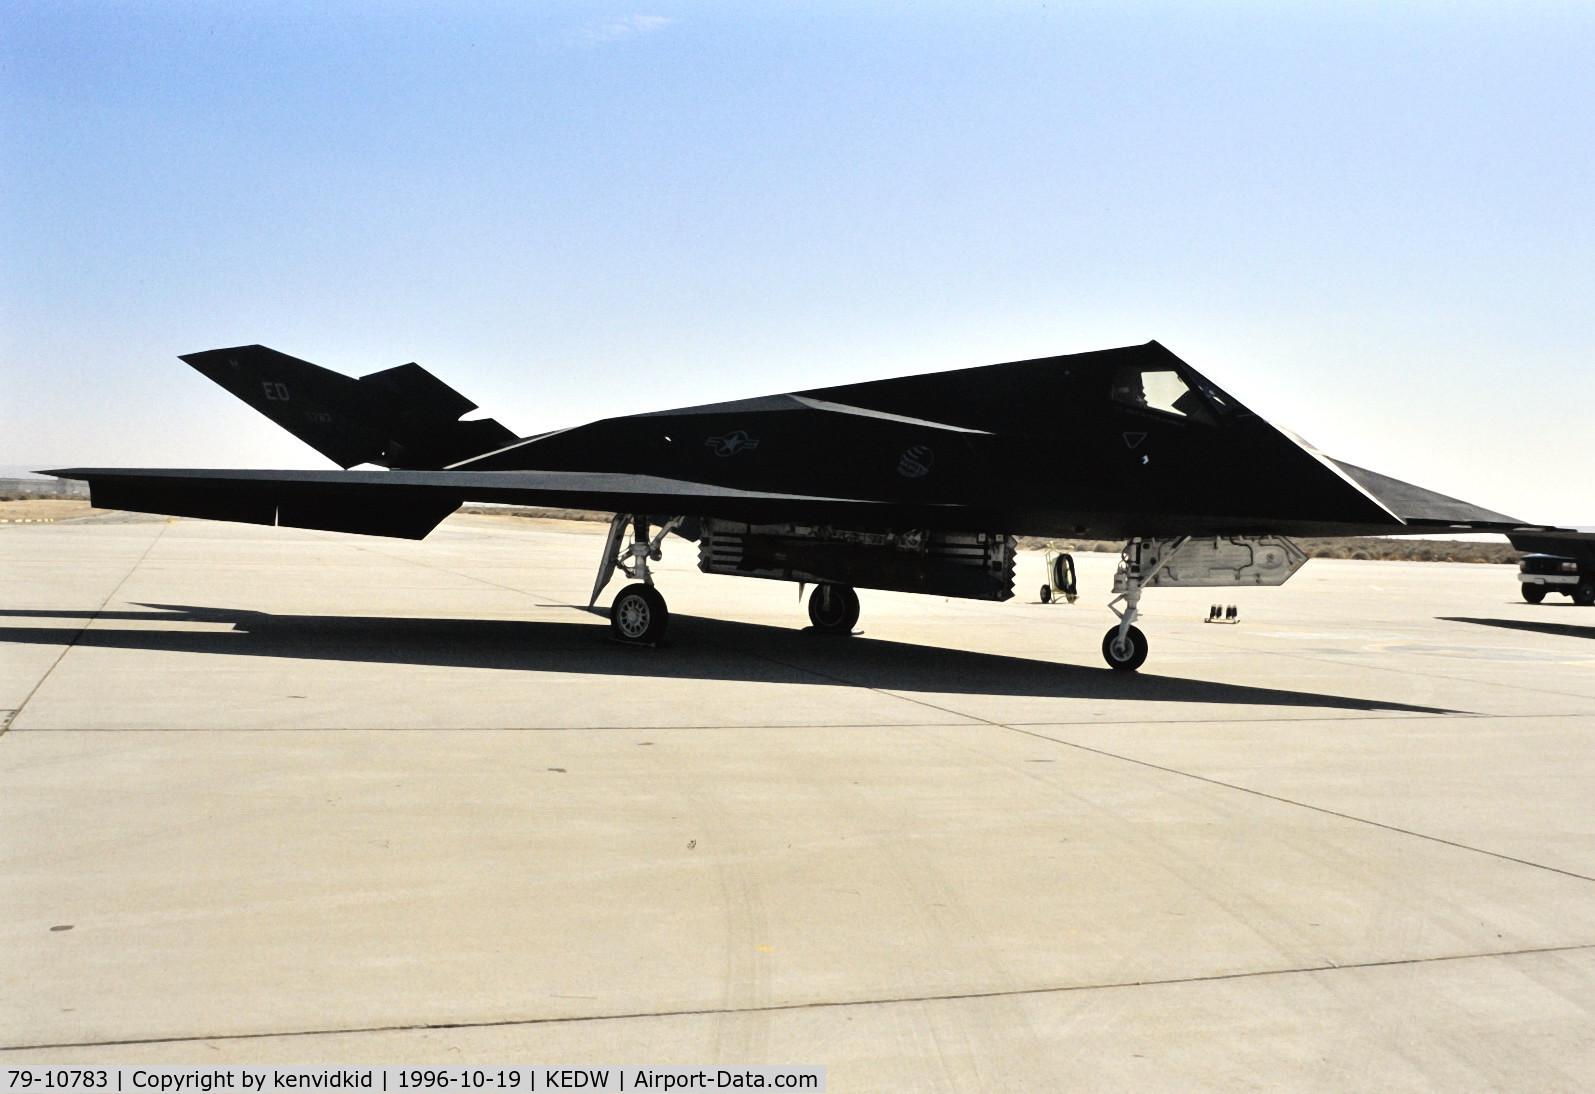 79-10783, 1979 Lockheed YF-117A Nighthawk C/N A.4008, On static display at the Edwards Open House 1996.